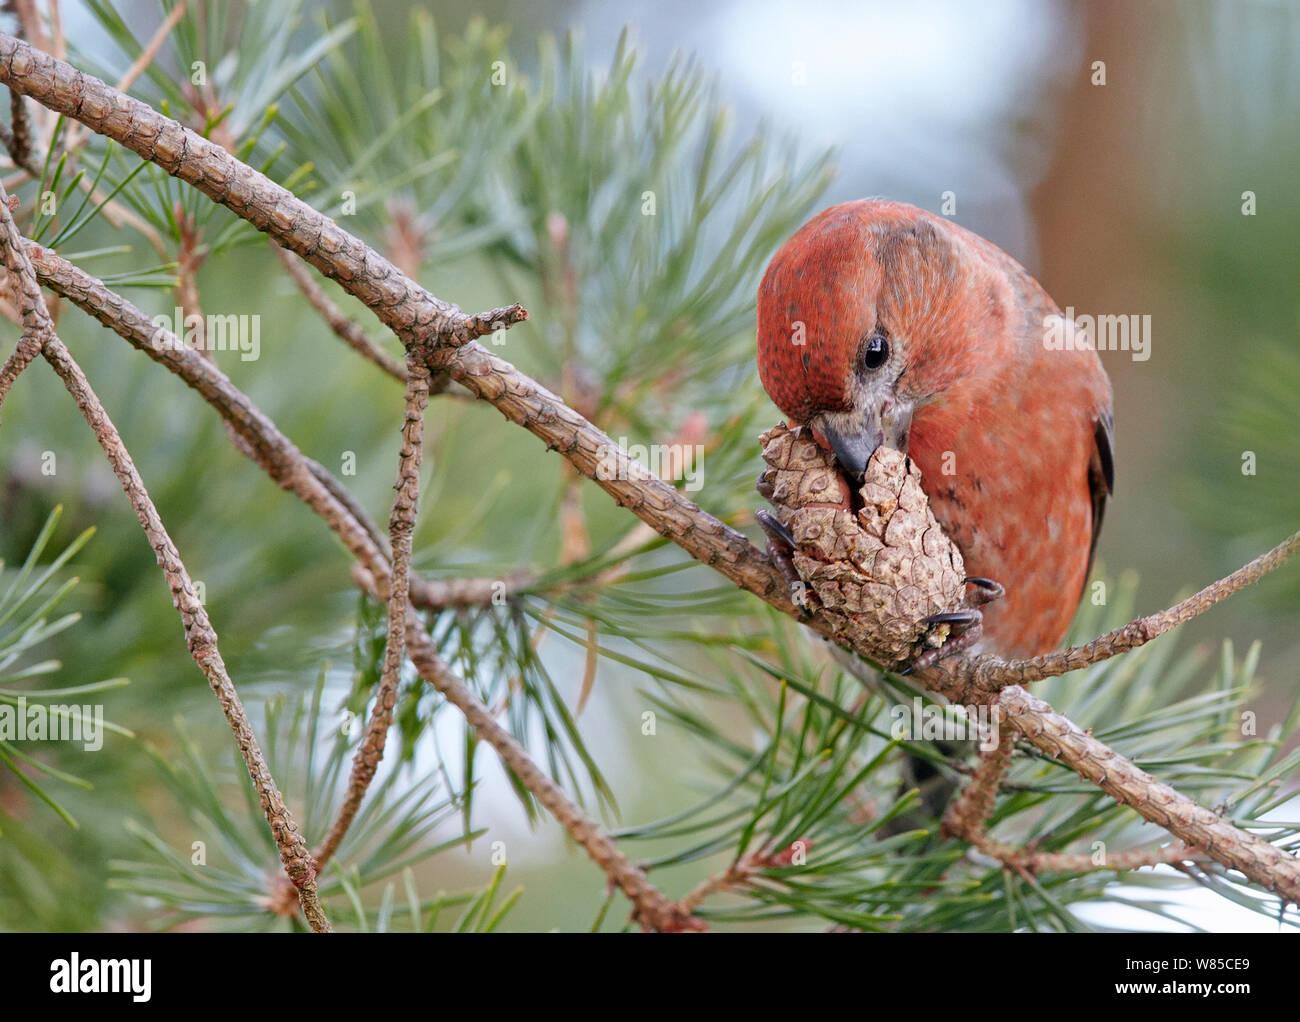 Male Parrot crossbill (Loxia pytyopsittacus) feeding, Uto, Finland, November. Stock Photo